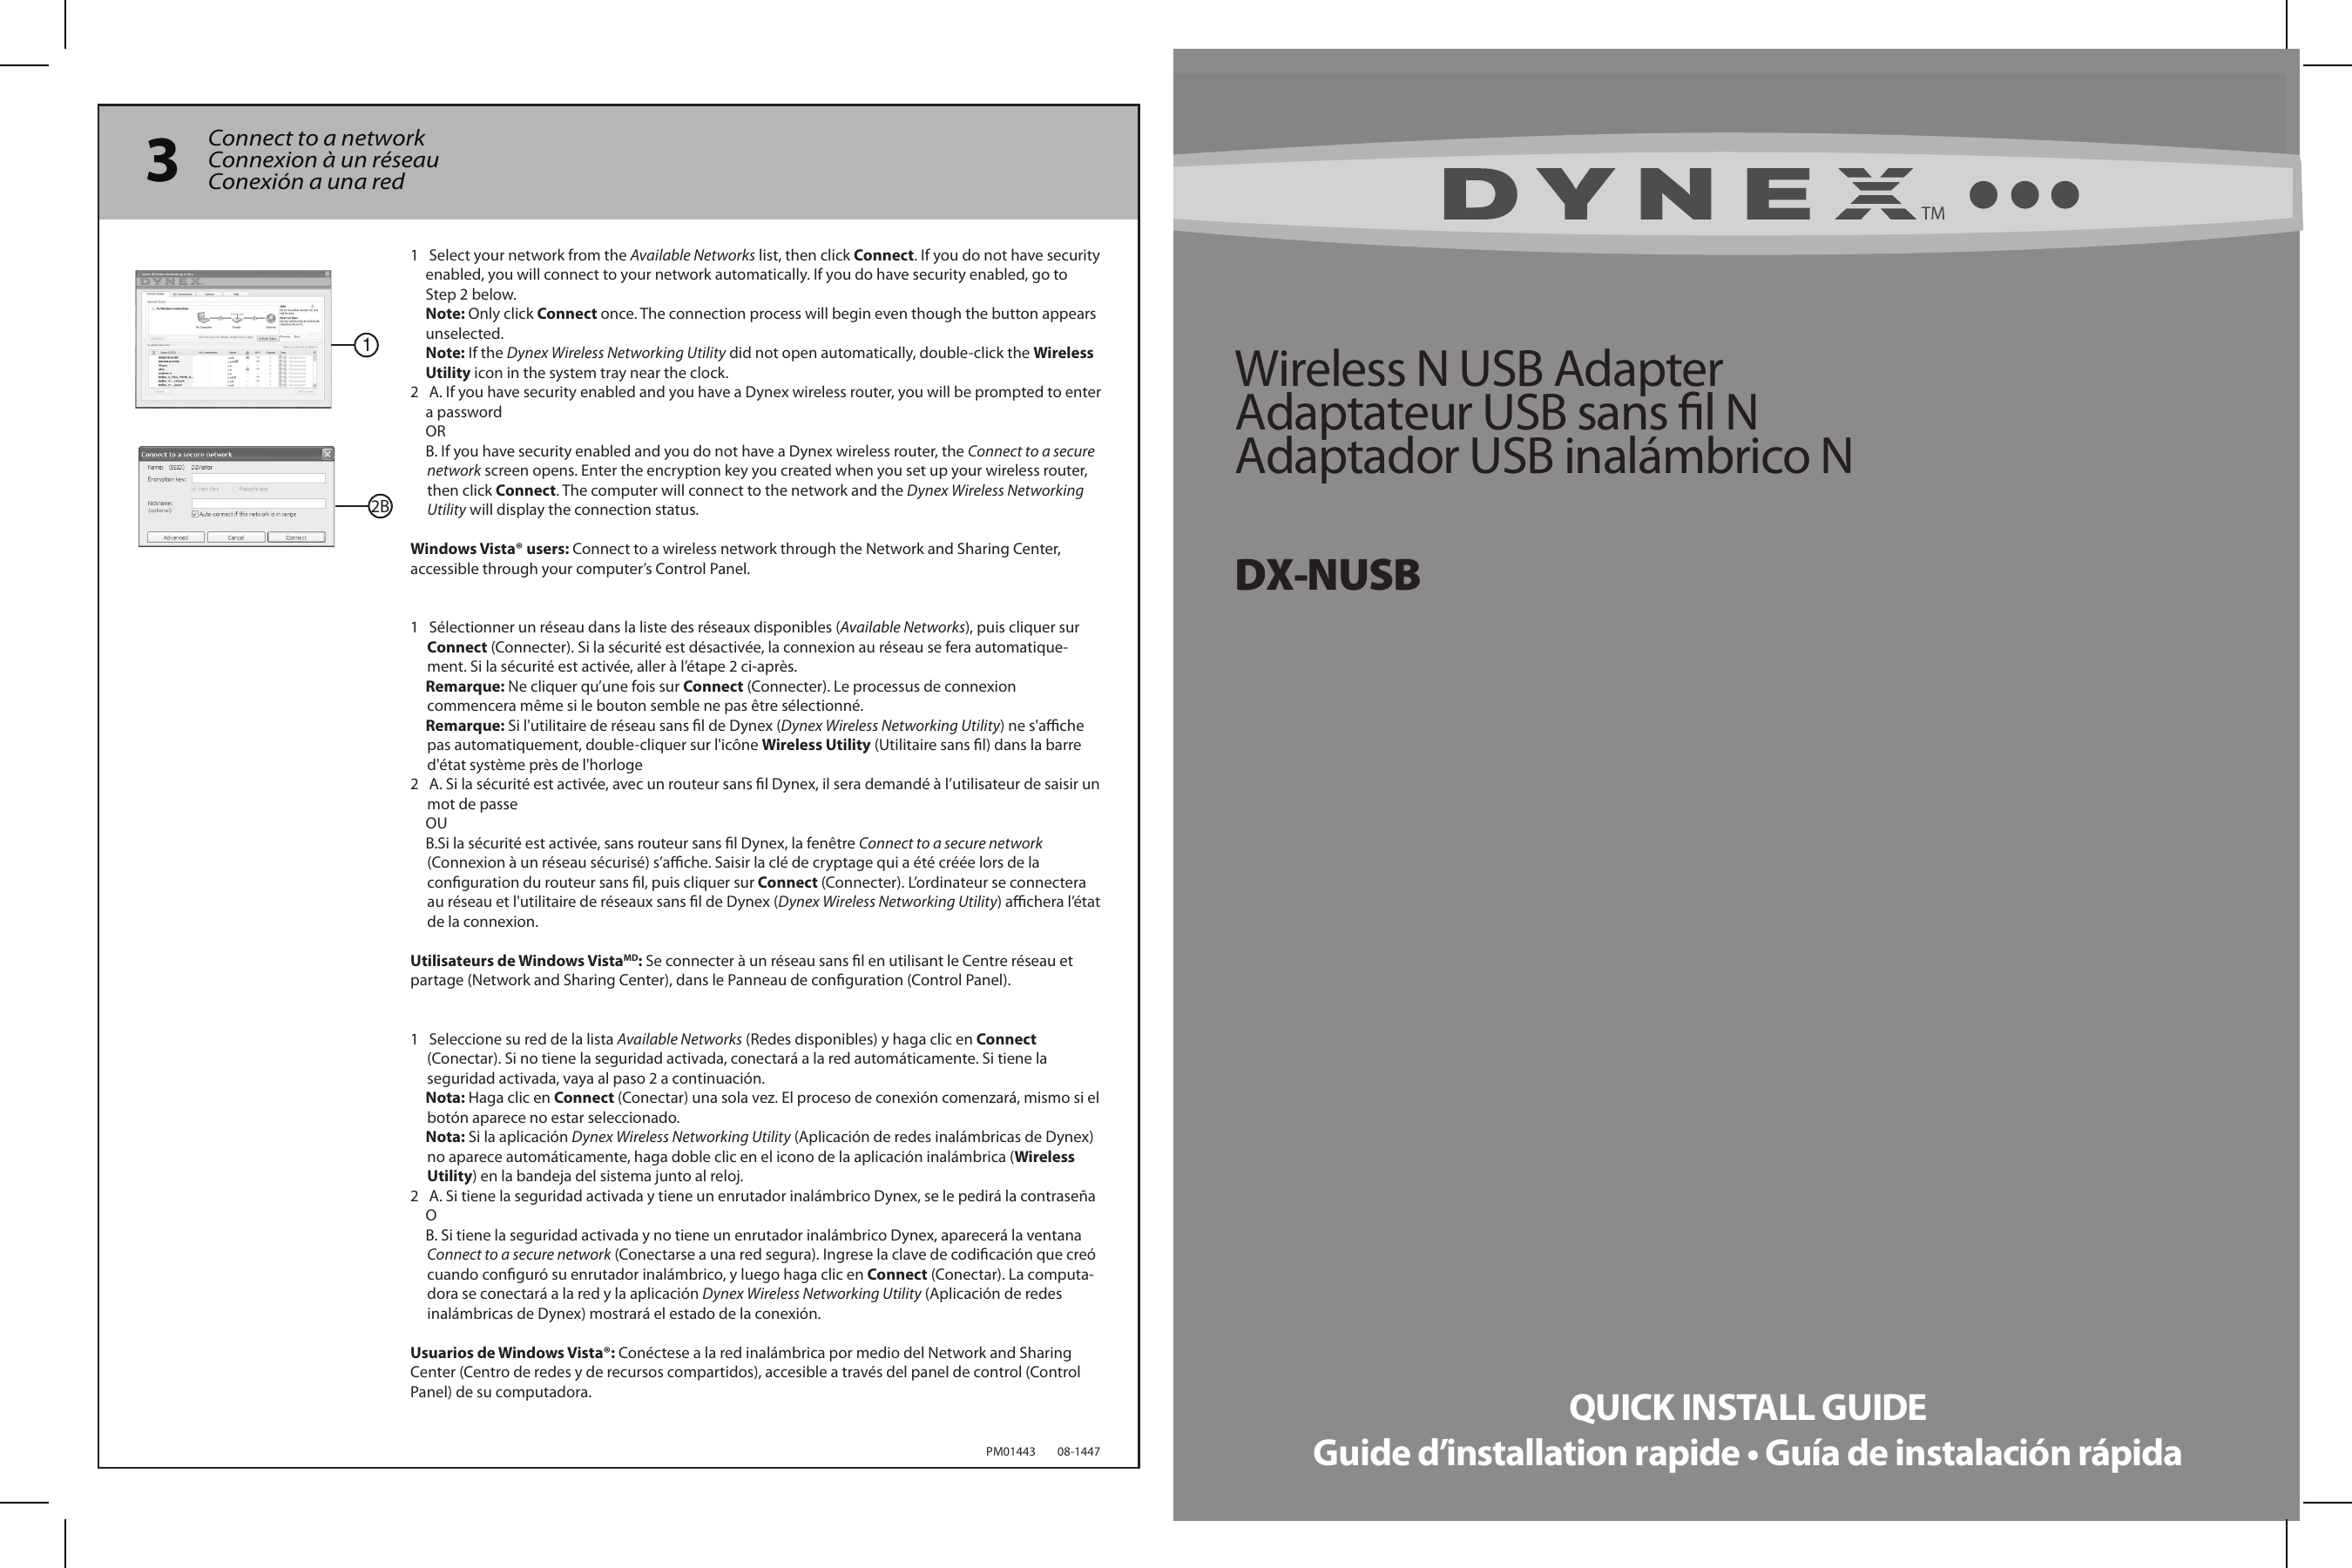 DX-NUSB DRIVER FOR WINDOWS